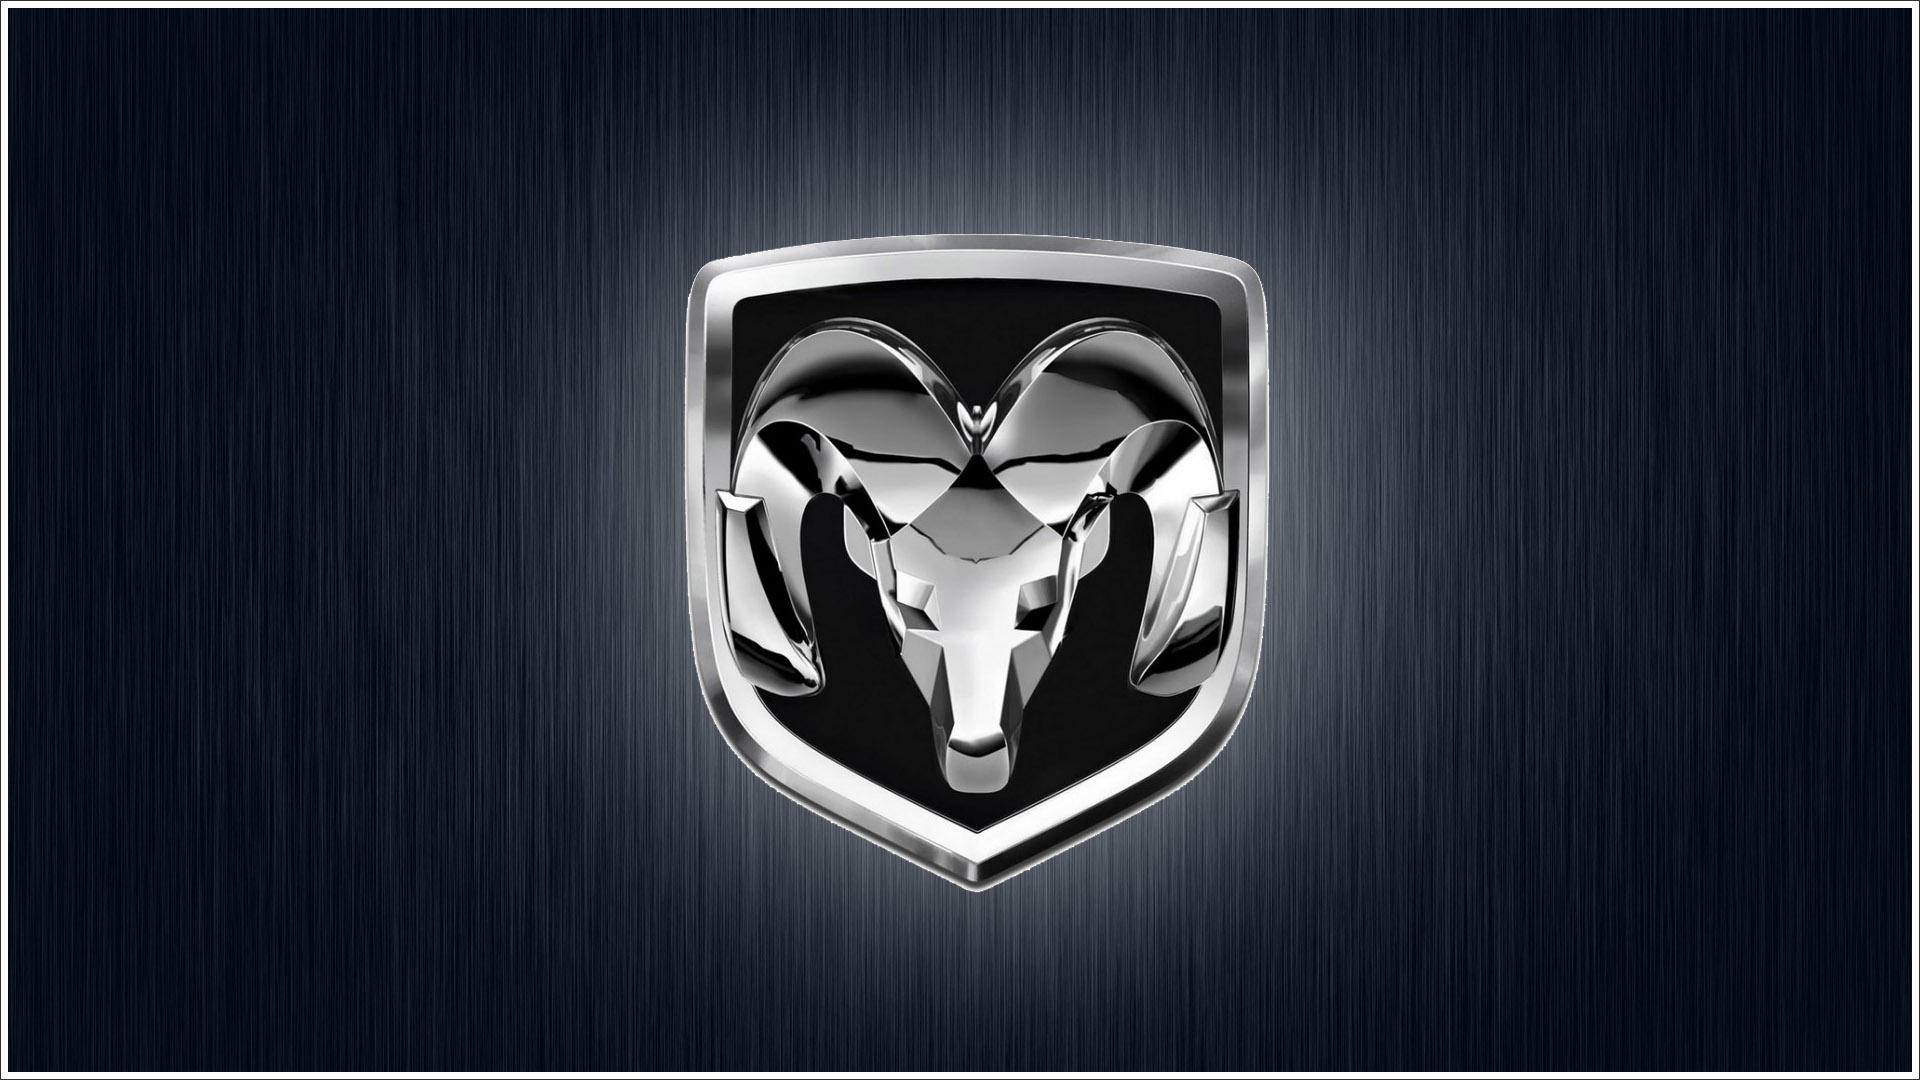 Ram truck Logos